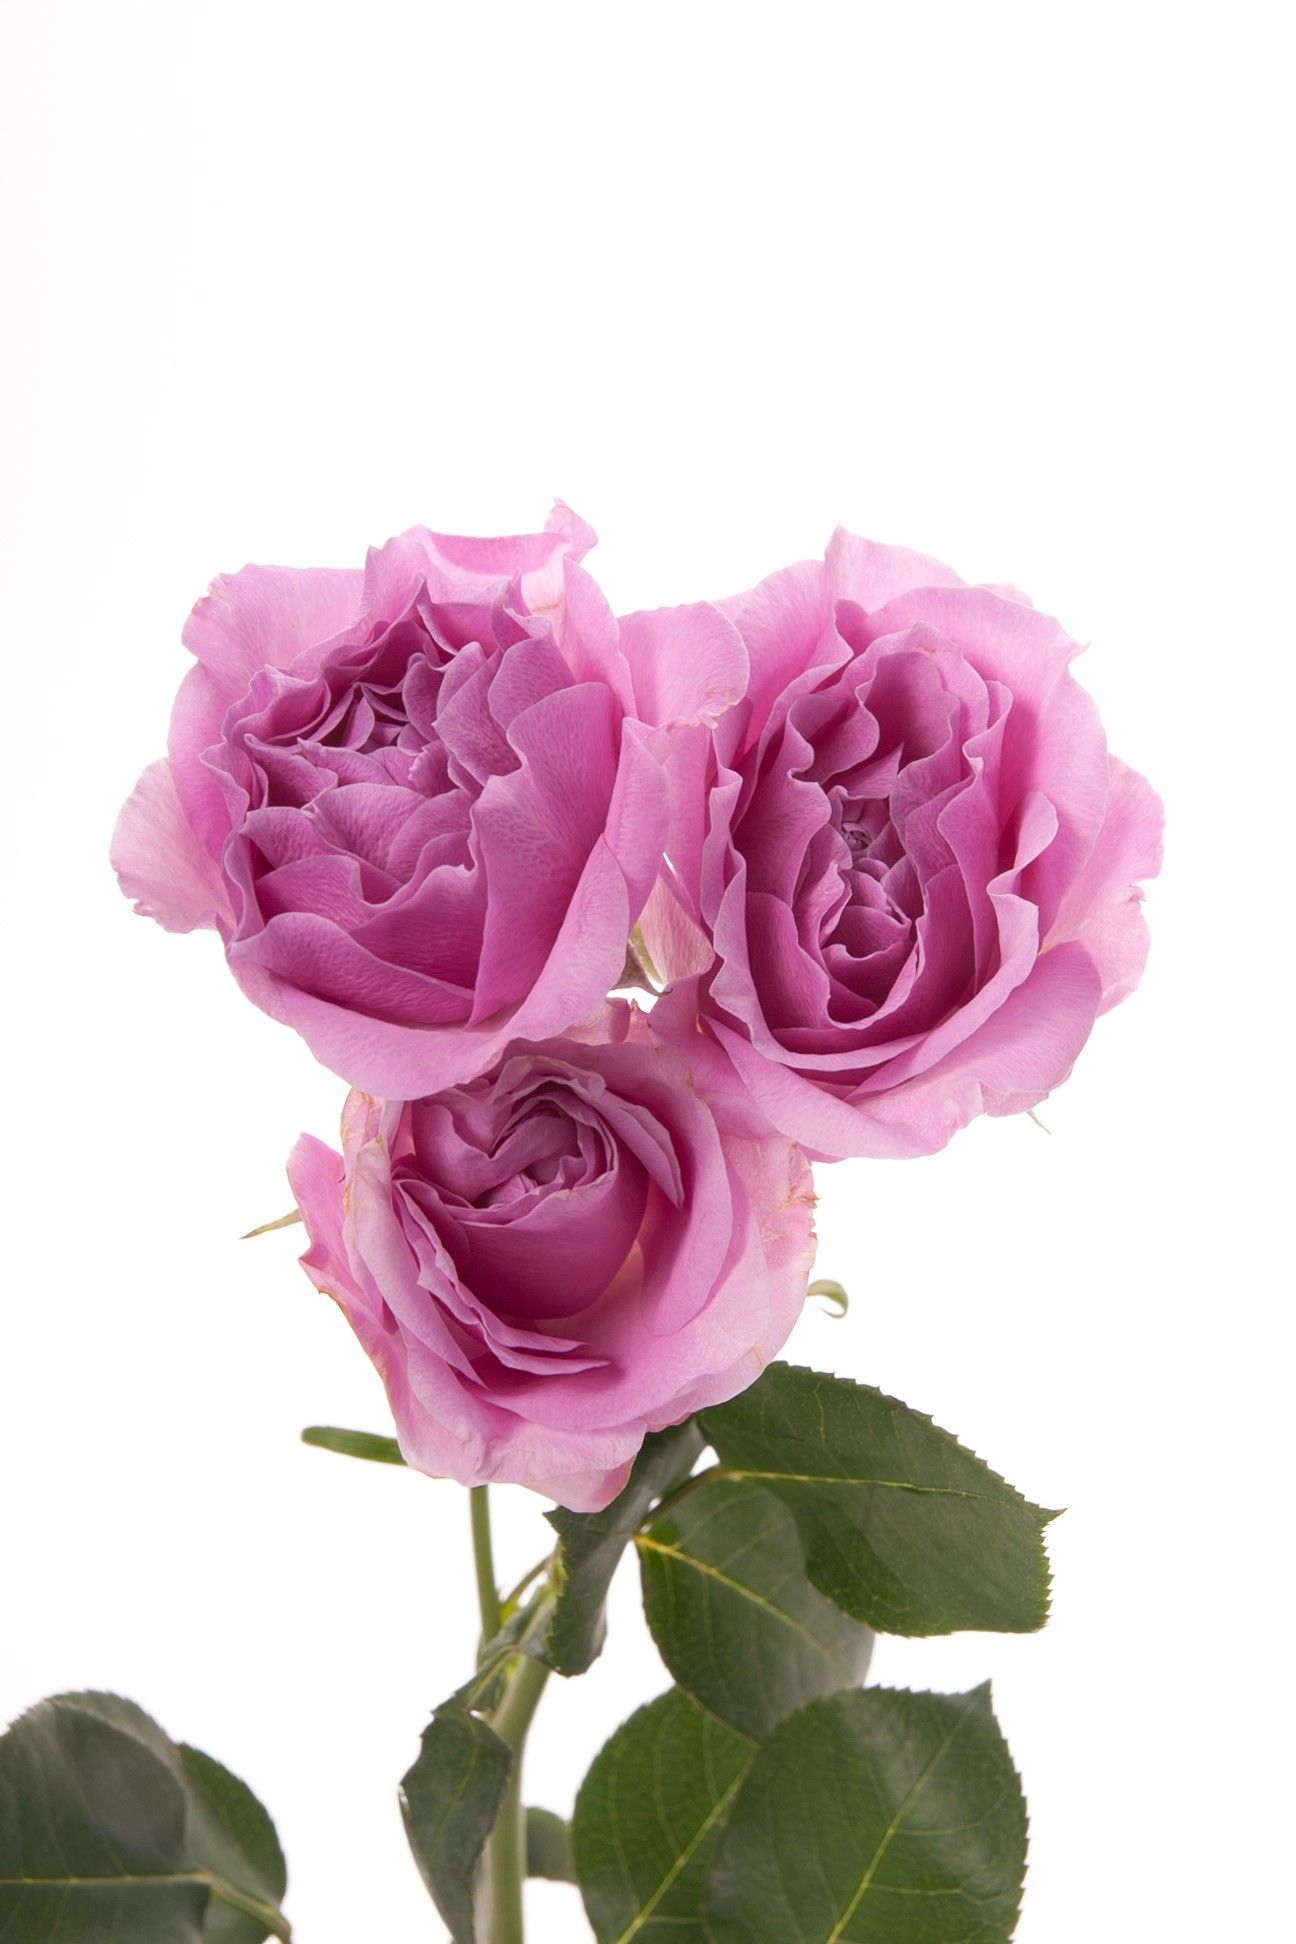 Lavender Spray Roses Blue Moon Spray Roses Roses Flower Muse Lavender Spray Lavender Flowers Spray Roses